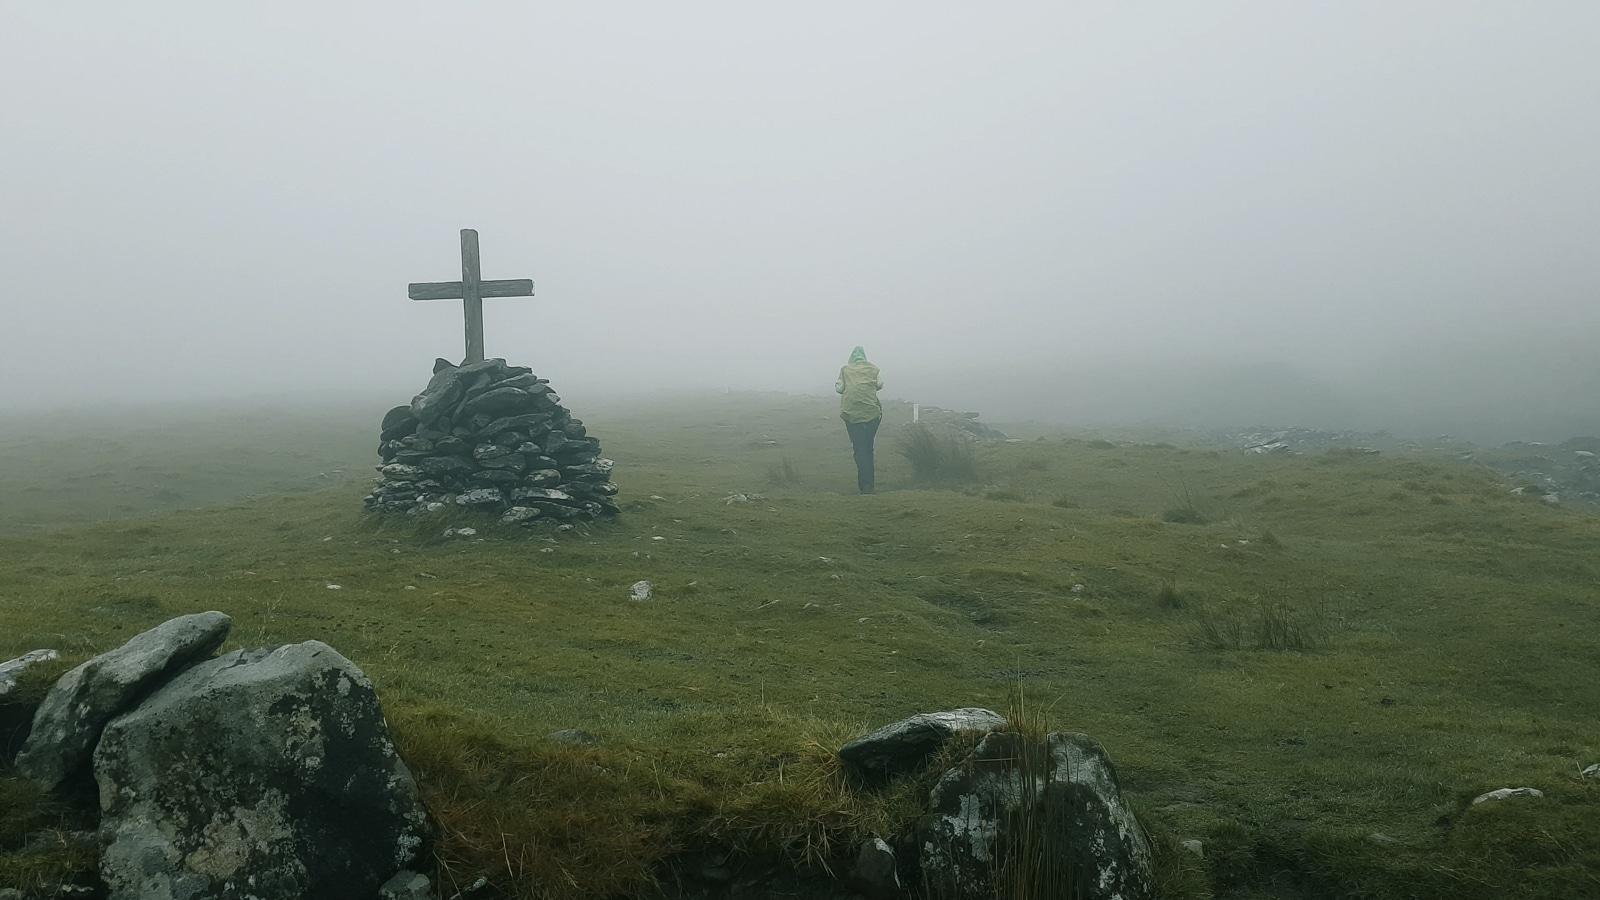 A failed attempt to climb Mt. Brandon Cross